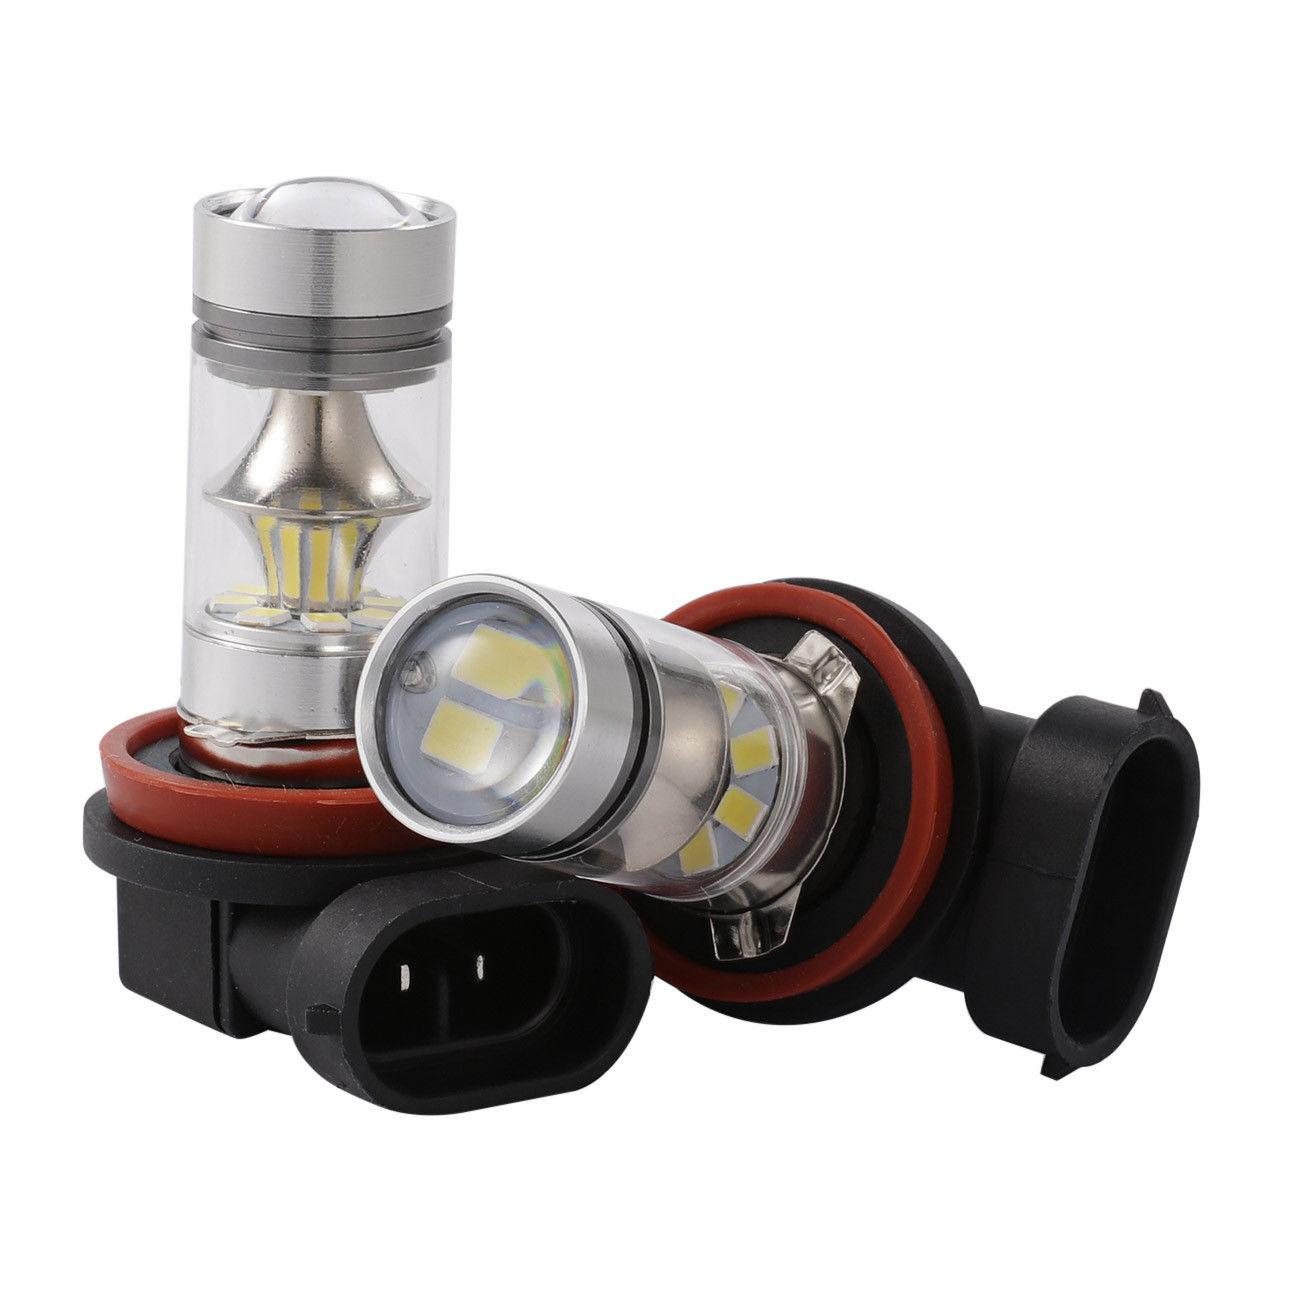 Amazing 6x Combo H11 9005 H11 Led Headlight Conversion Kit High Low Beam Fog Light 6000k 2019